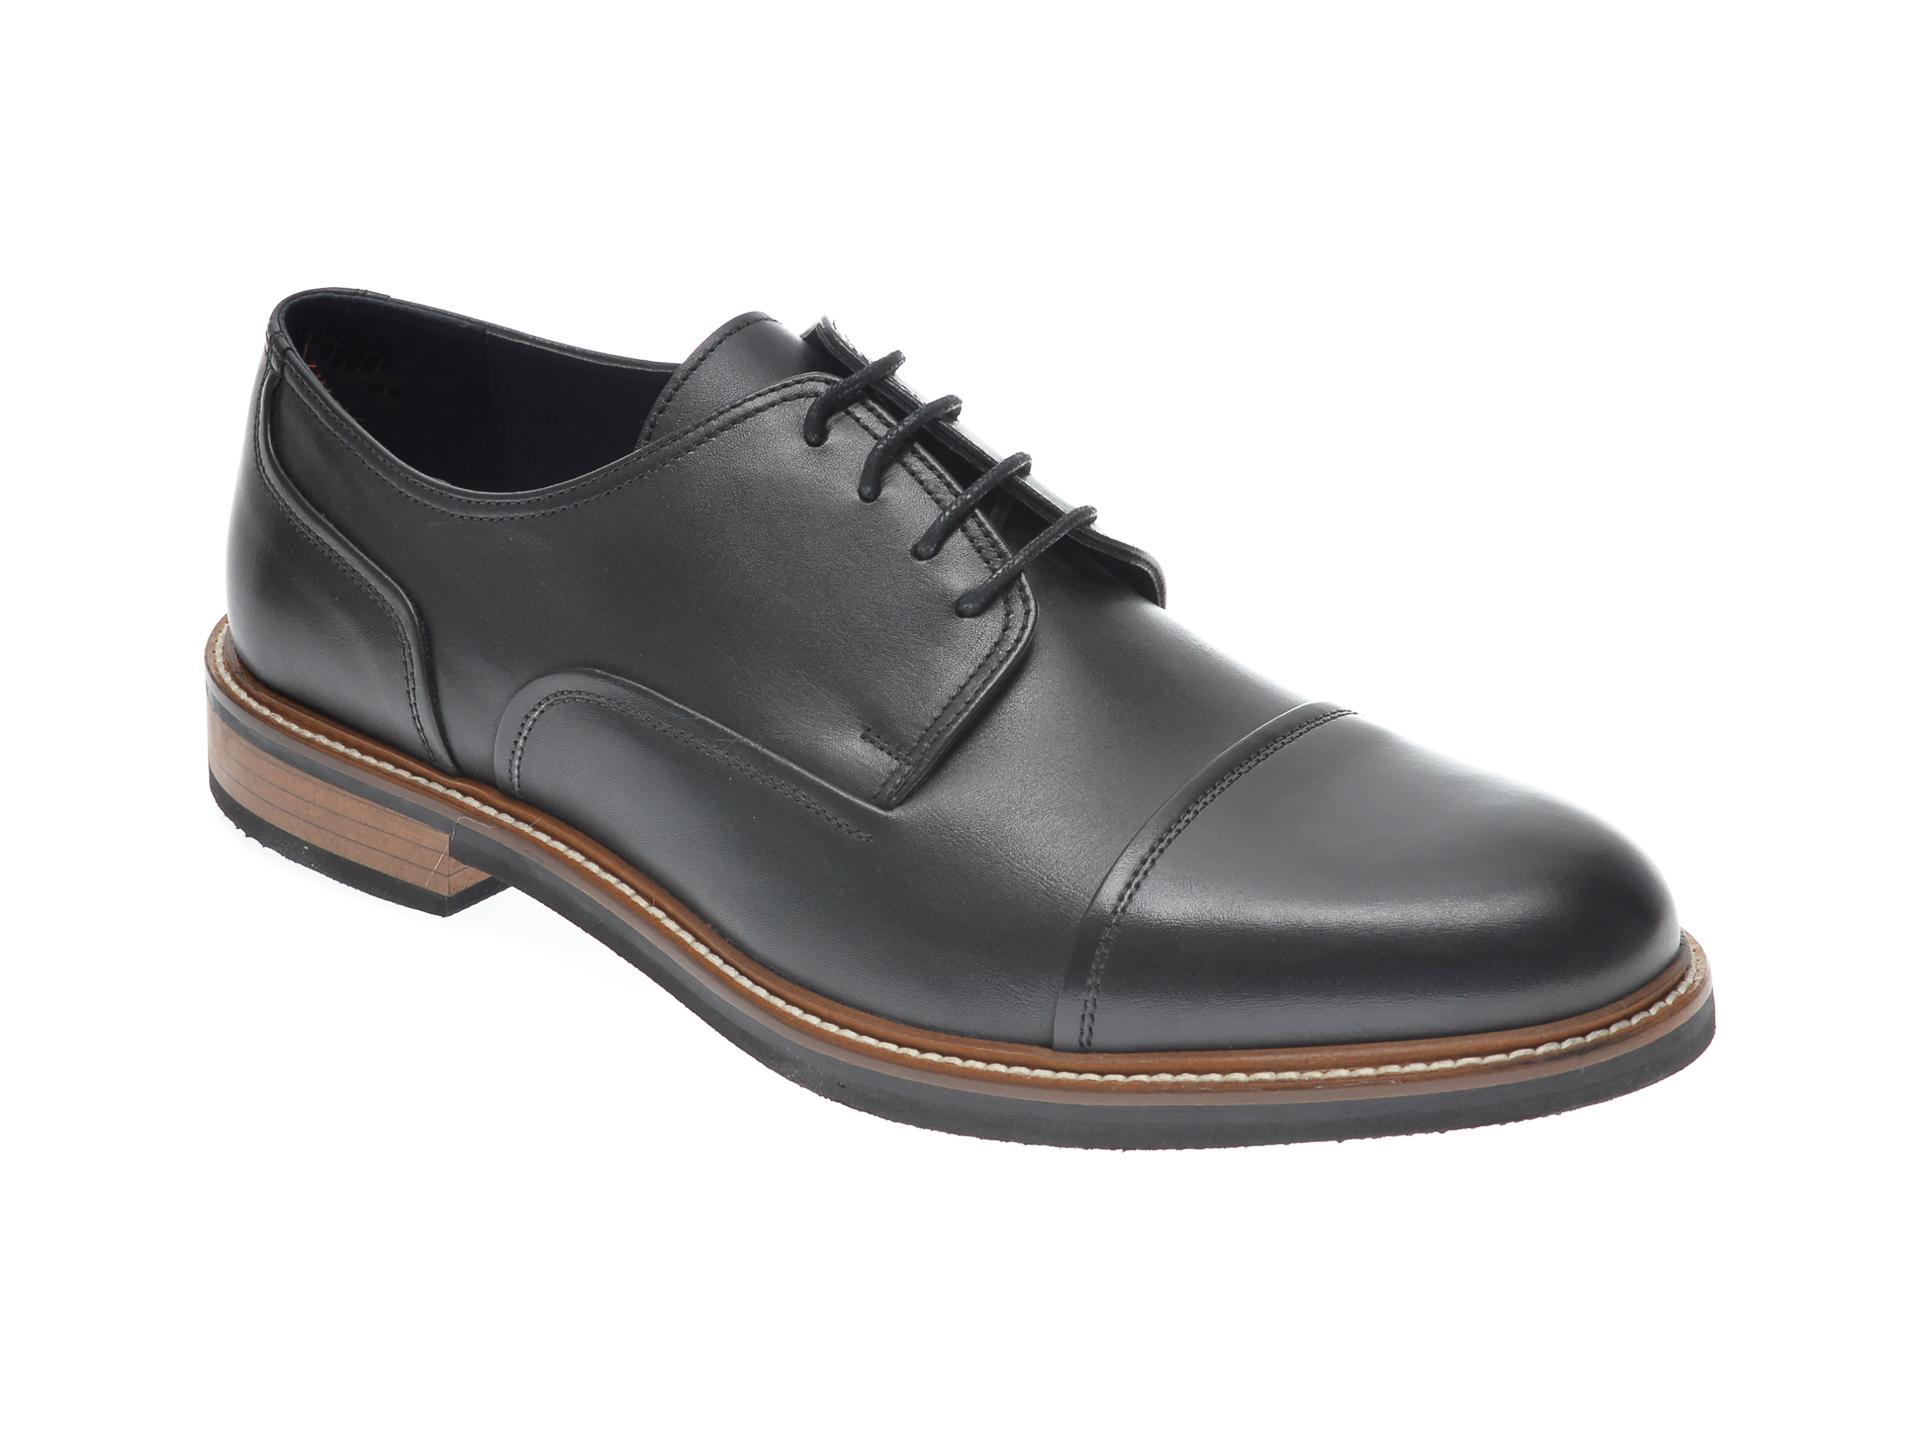 Pantofi OTTER negri, 7843, din piele naturala imagine